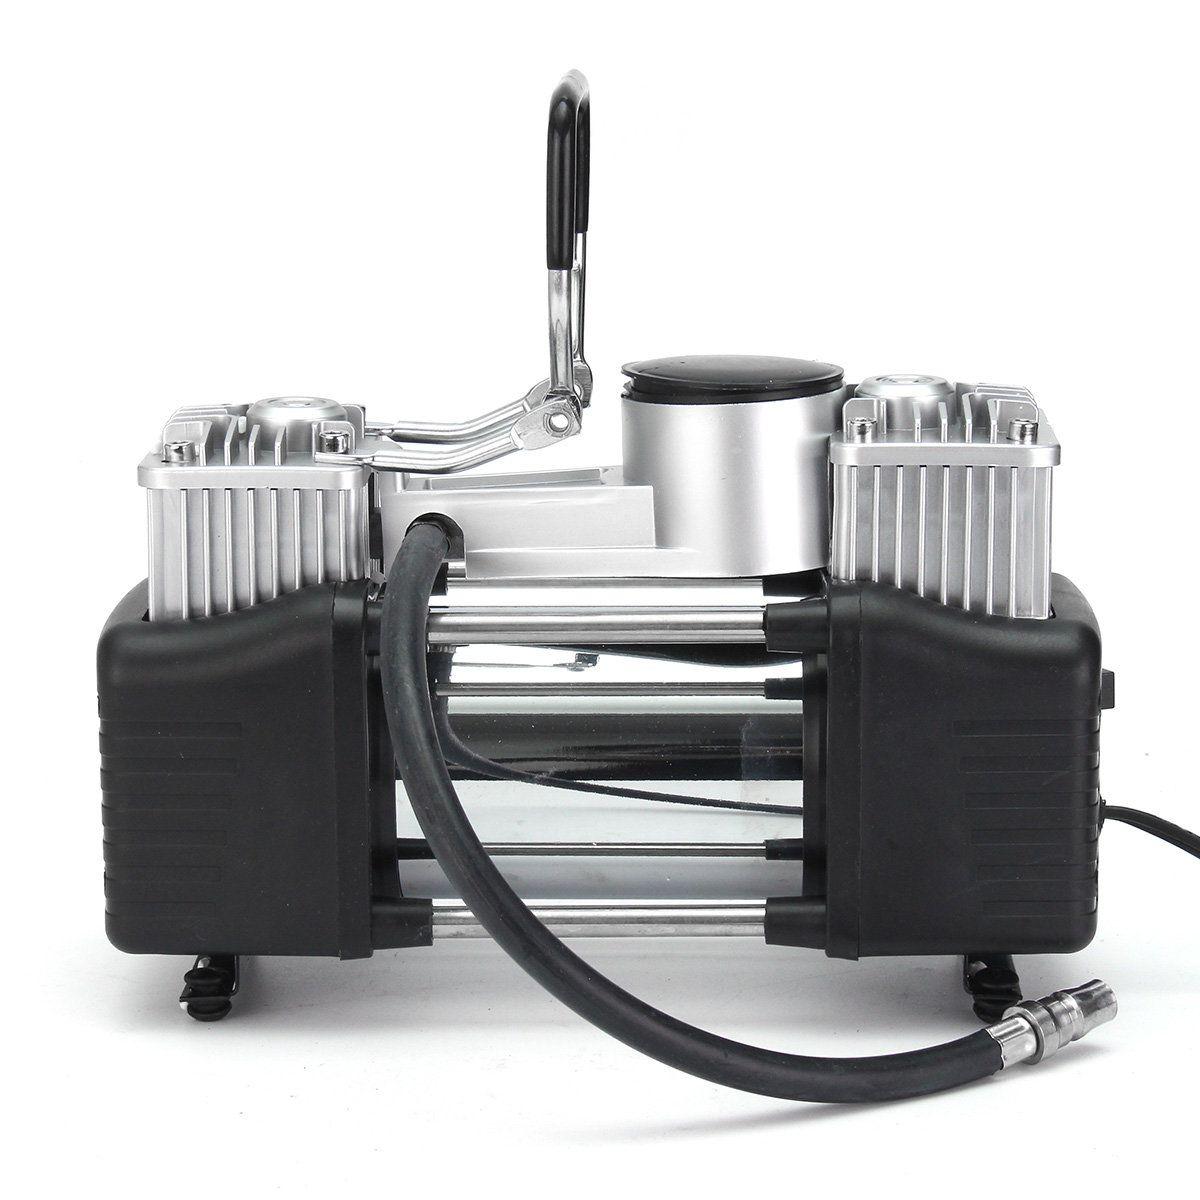 12V 150PSI Double Cylinder Air Pump Compressor Tire Tyre Inflator For Car Bike Van